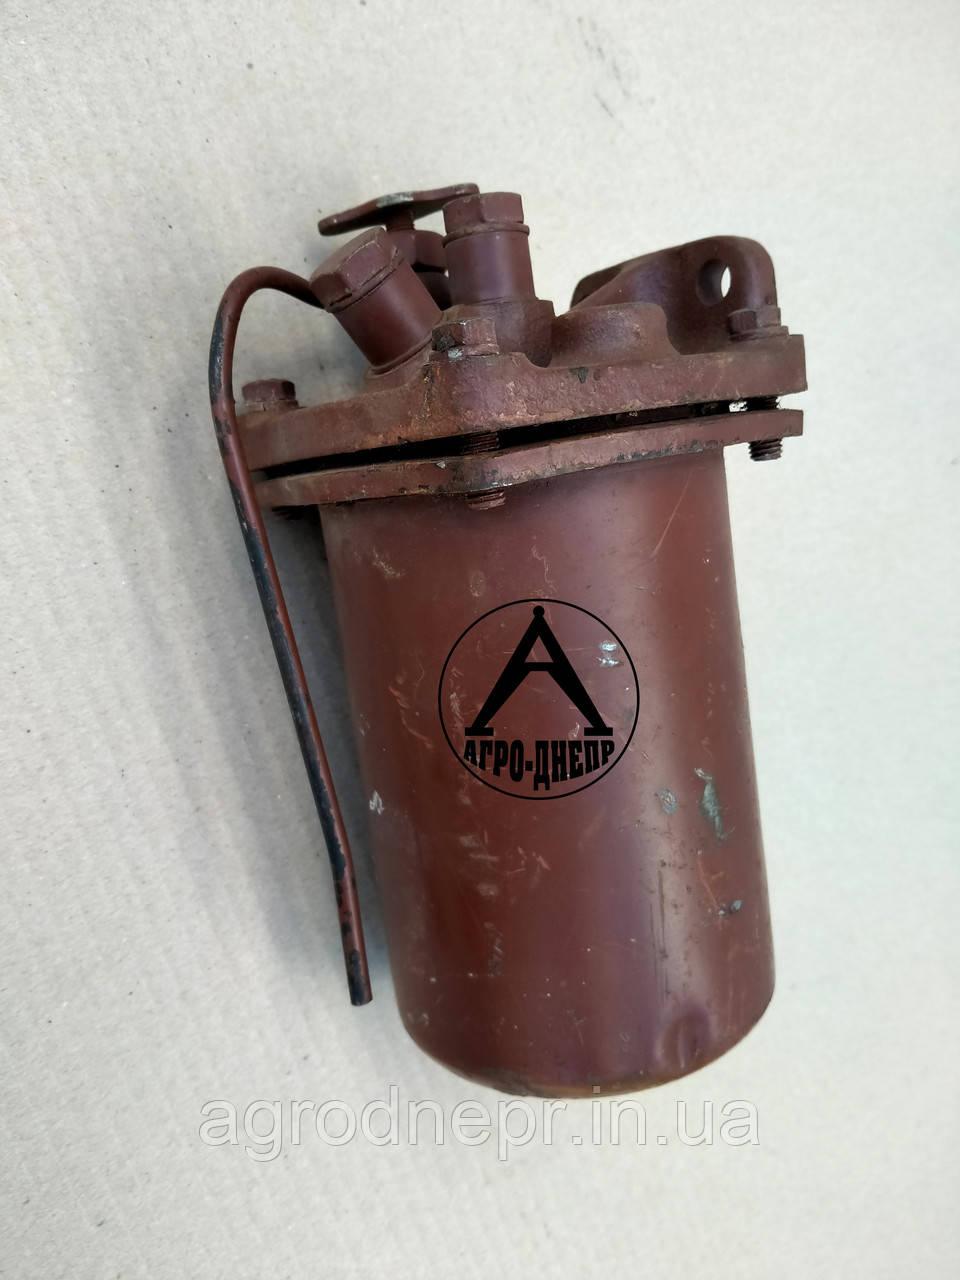 Фильтр тонкой очистки топлива Д-37, Д-144 А65.01.100